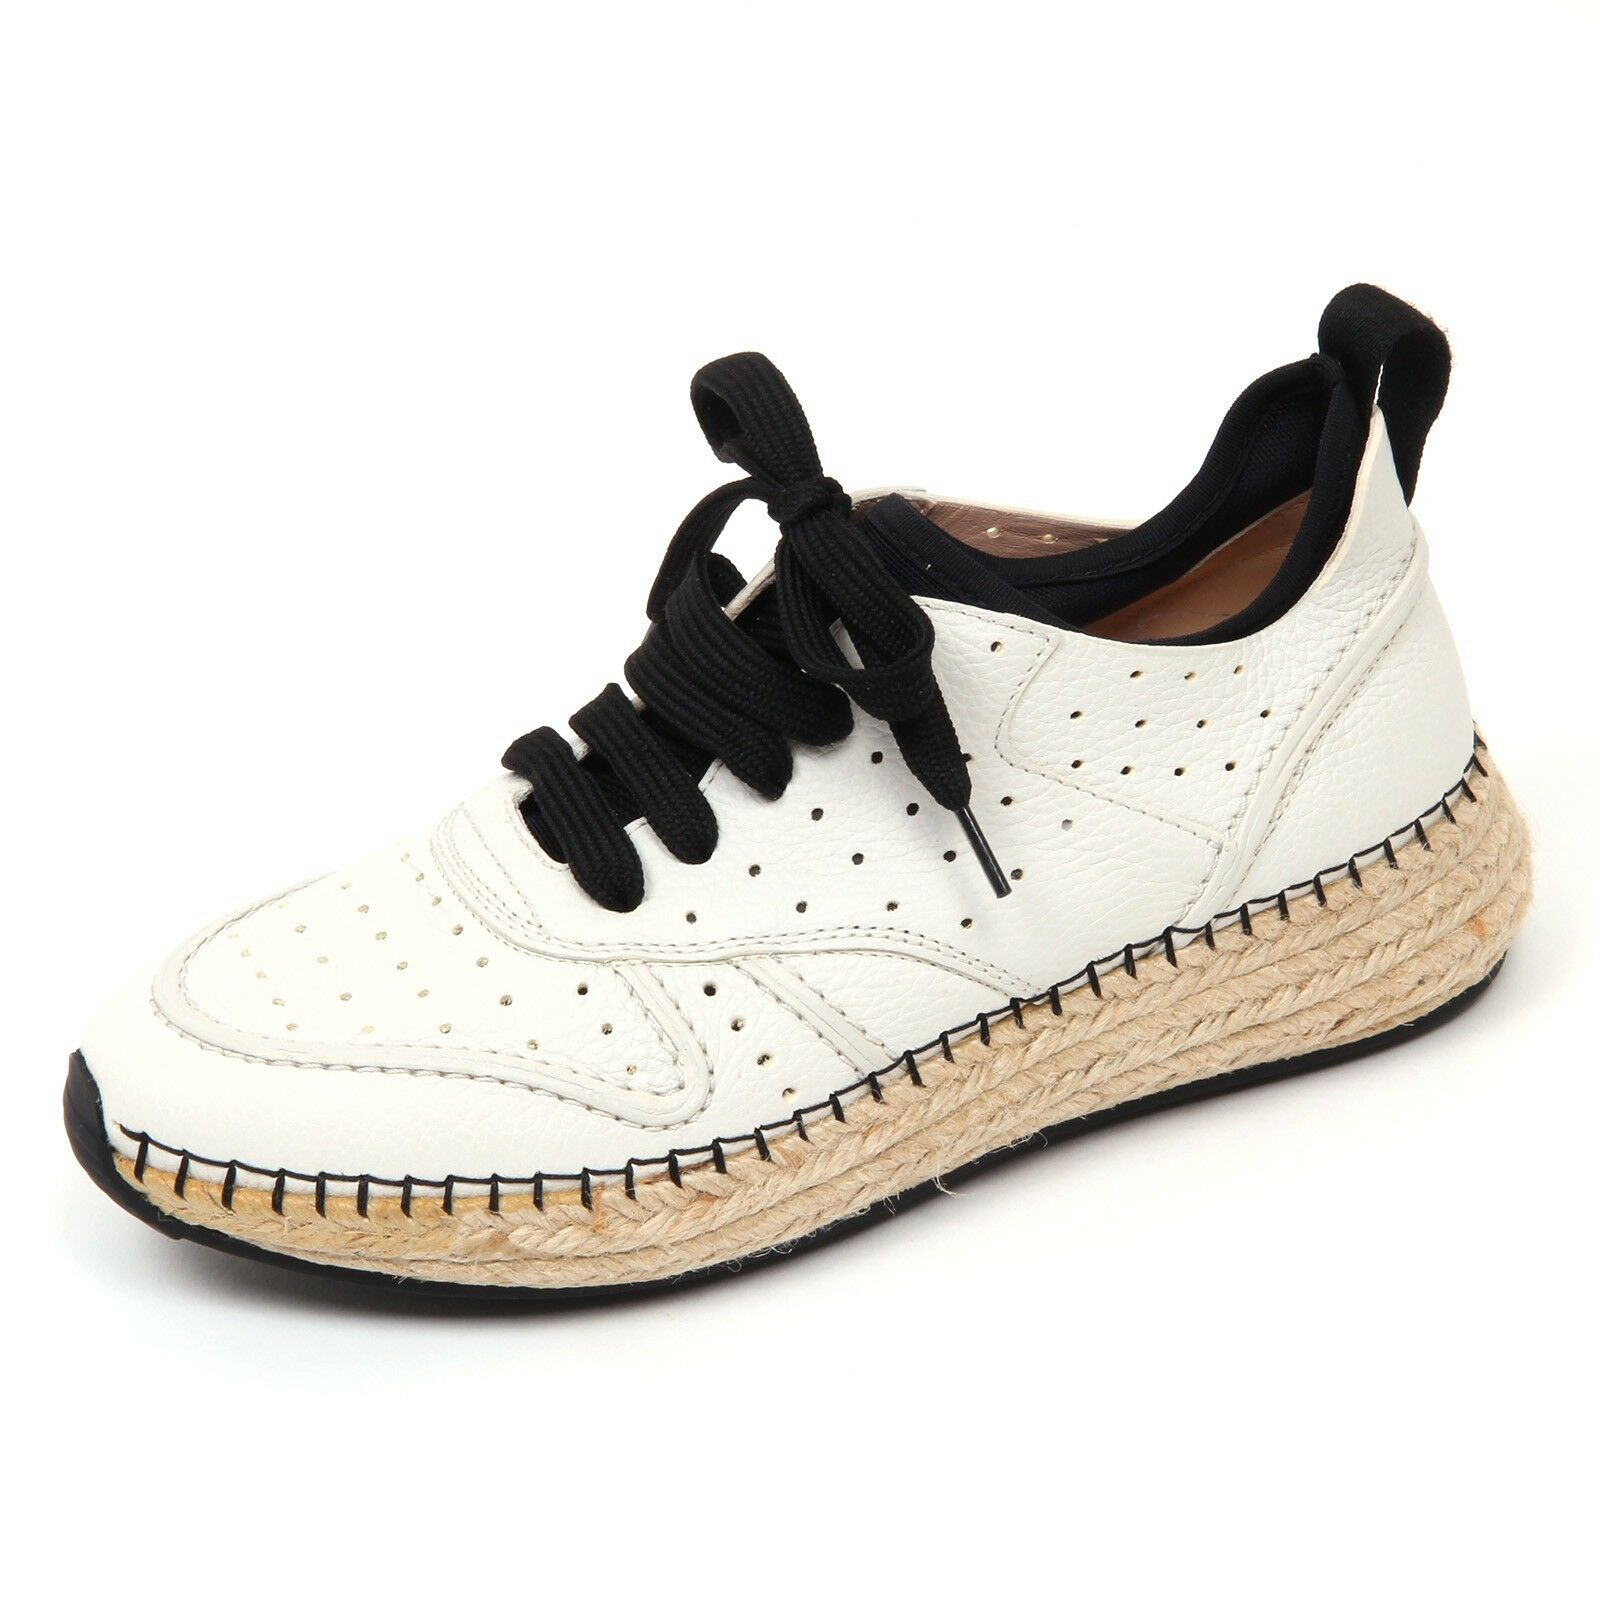 D0518 sneaker donna avorio TOD'S scarpa run rafia 29A forata avorio donna shoe woman 50a843